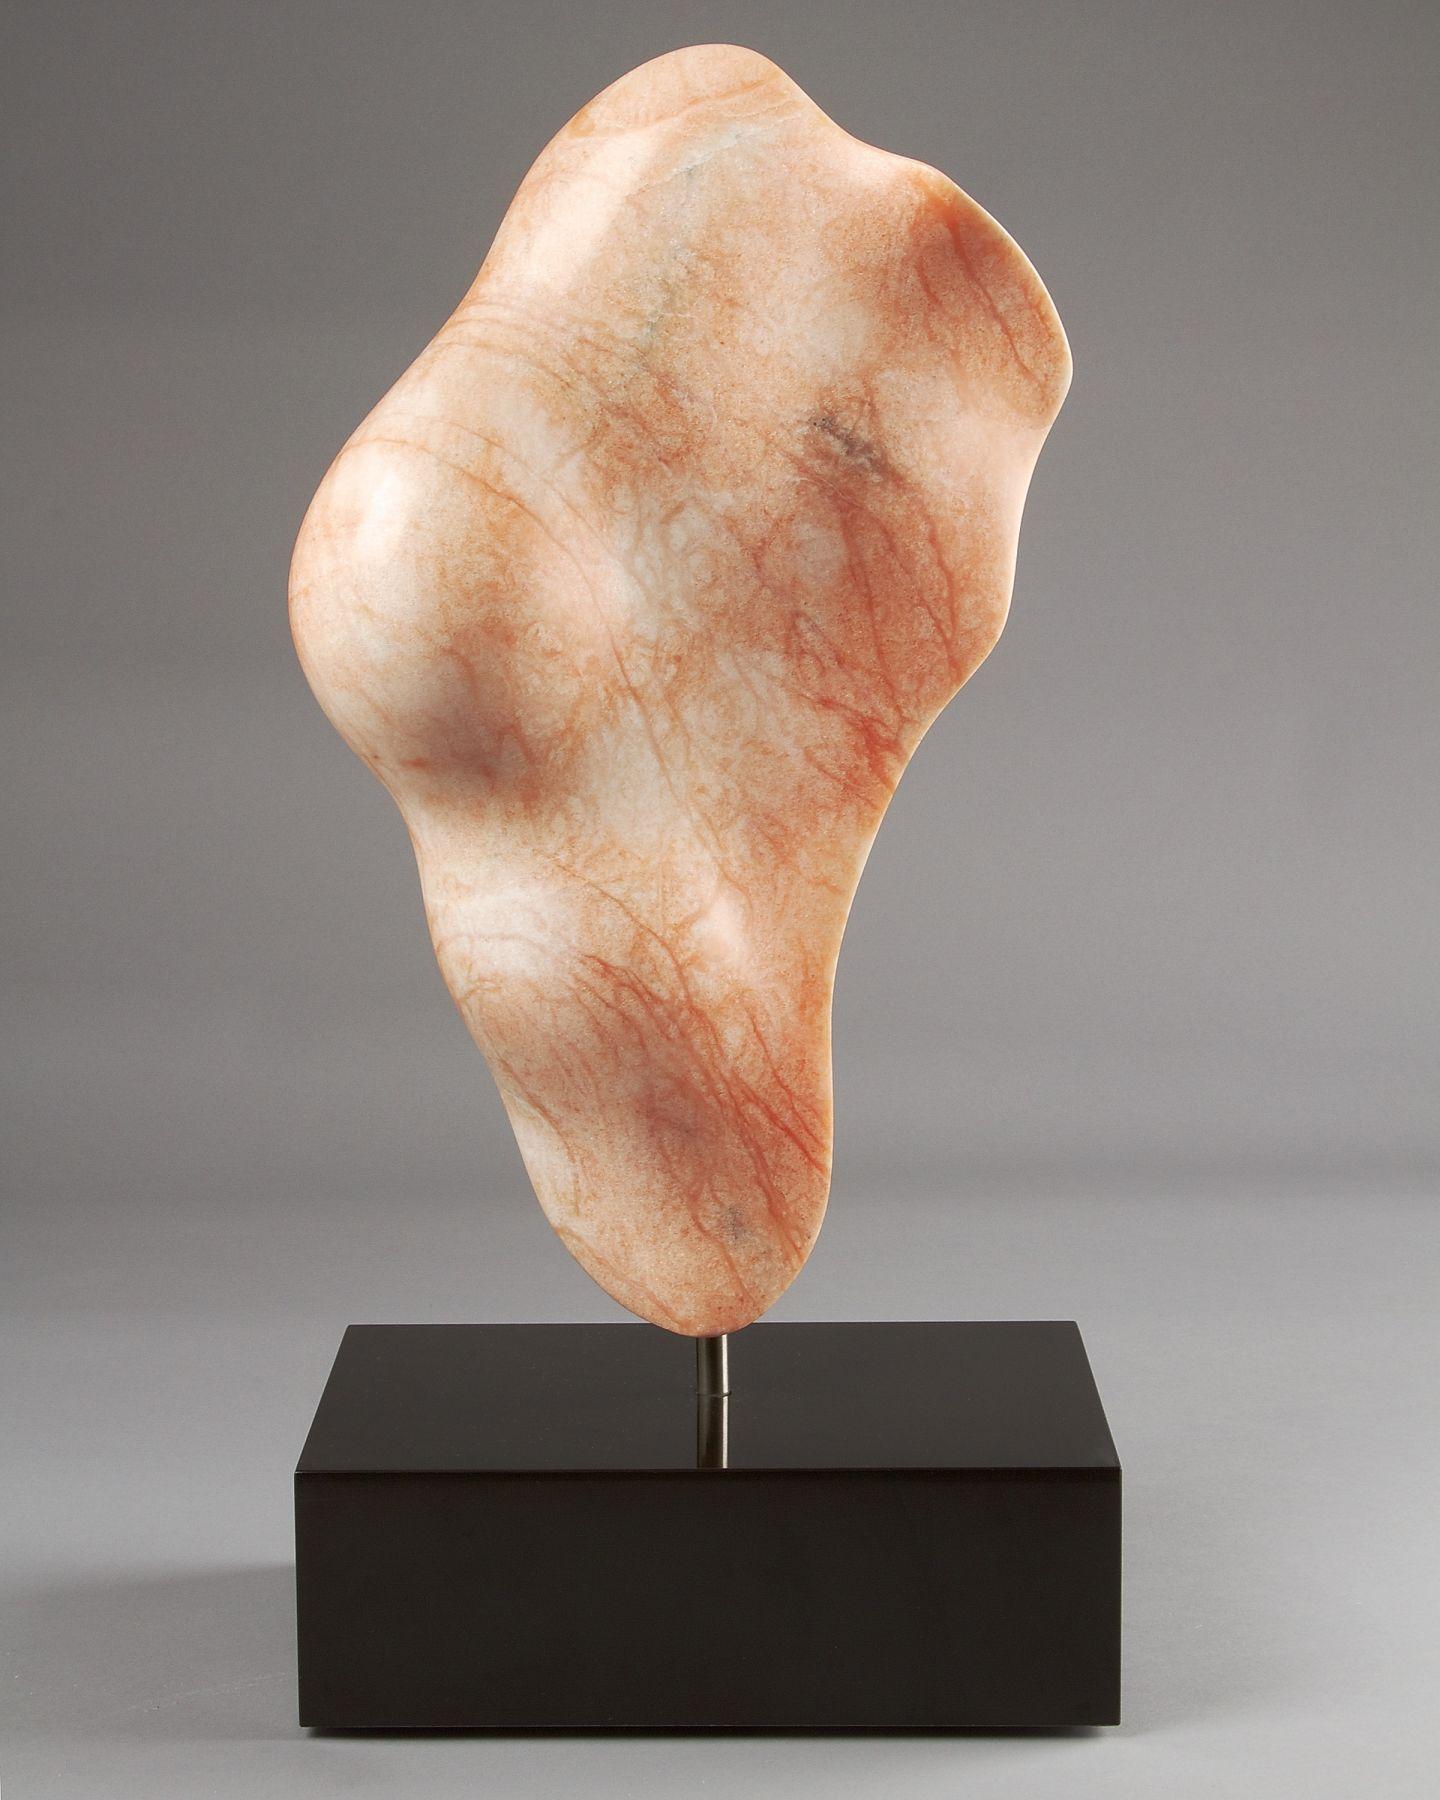 Charlie Kaplan, Embryo, 1993, front view